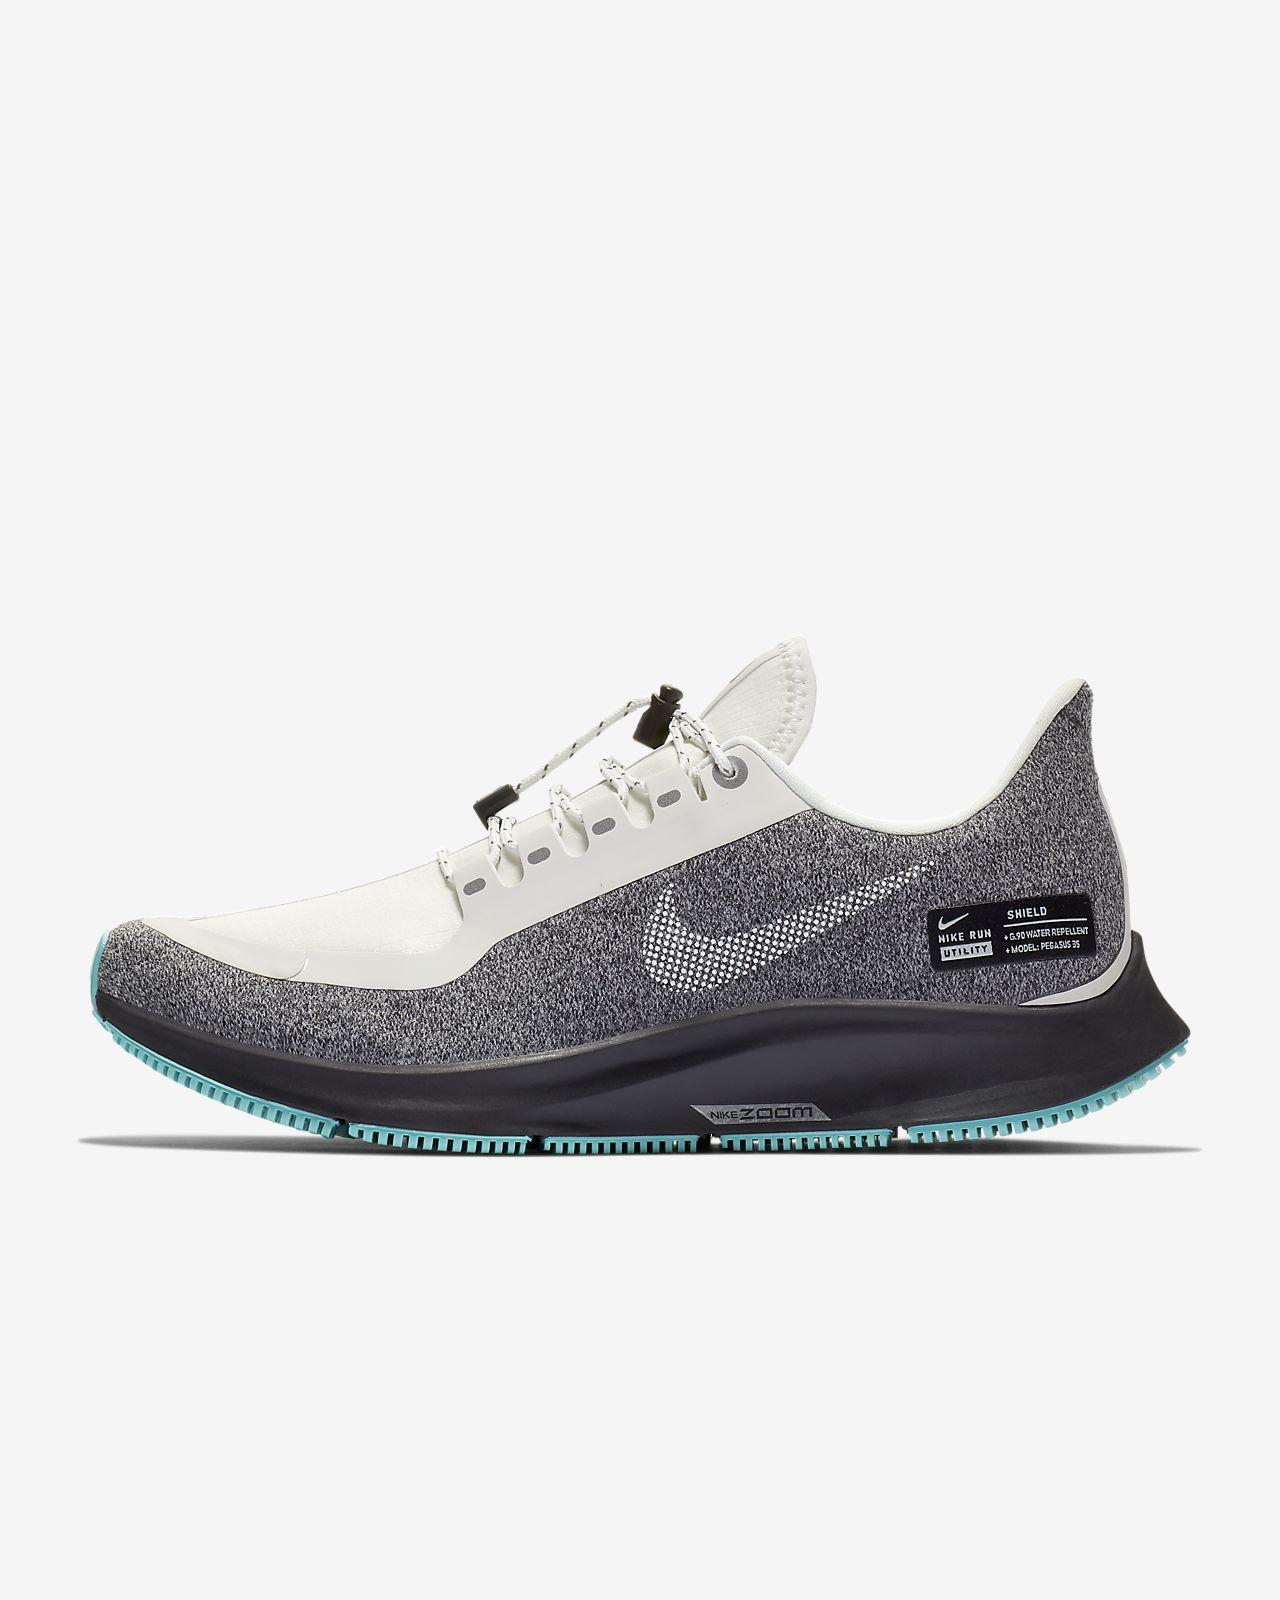 buy popular 866c1 20506 ... Chaussure de running Nike Air Zoom Pegasus 35 Shield Water-Repellent  pour Femme